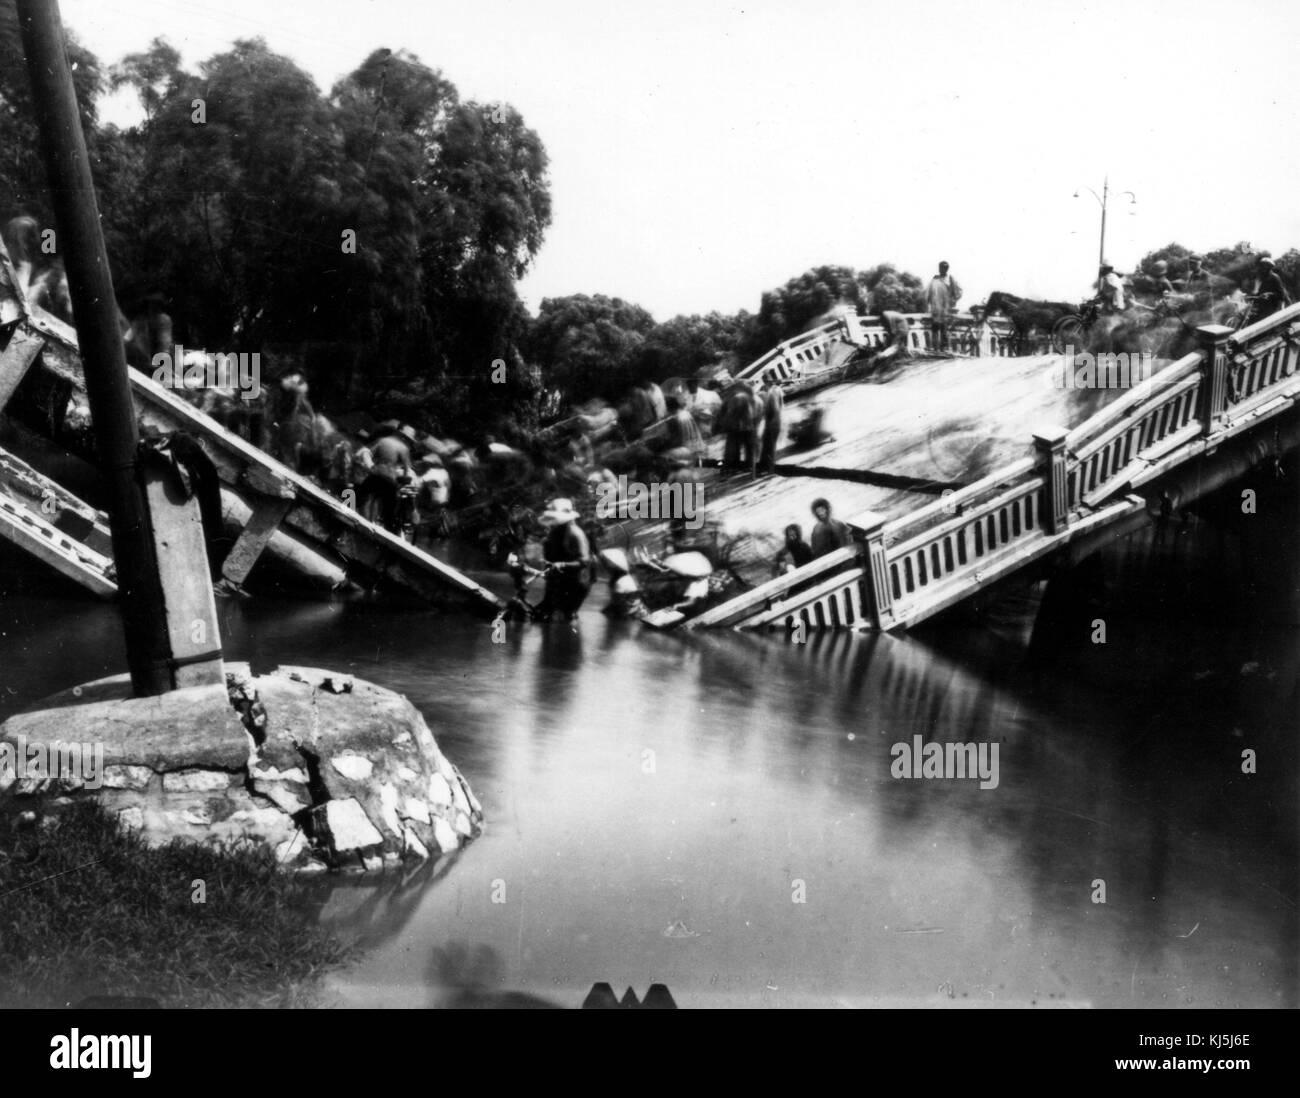 Tangshan, China, Earthquake July 28, 1976 The Chengli Bridge in Tangshan - Stock Image